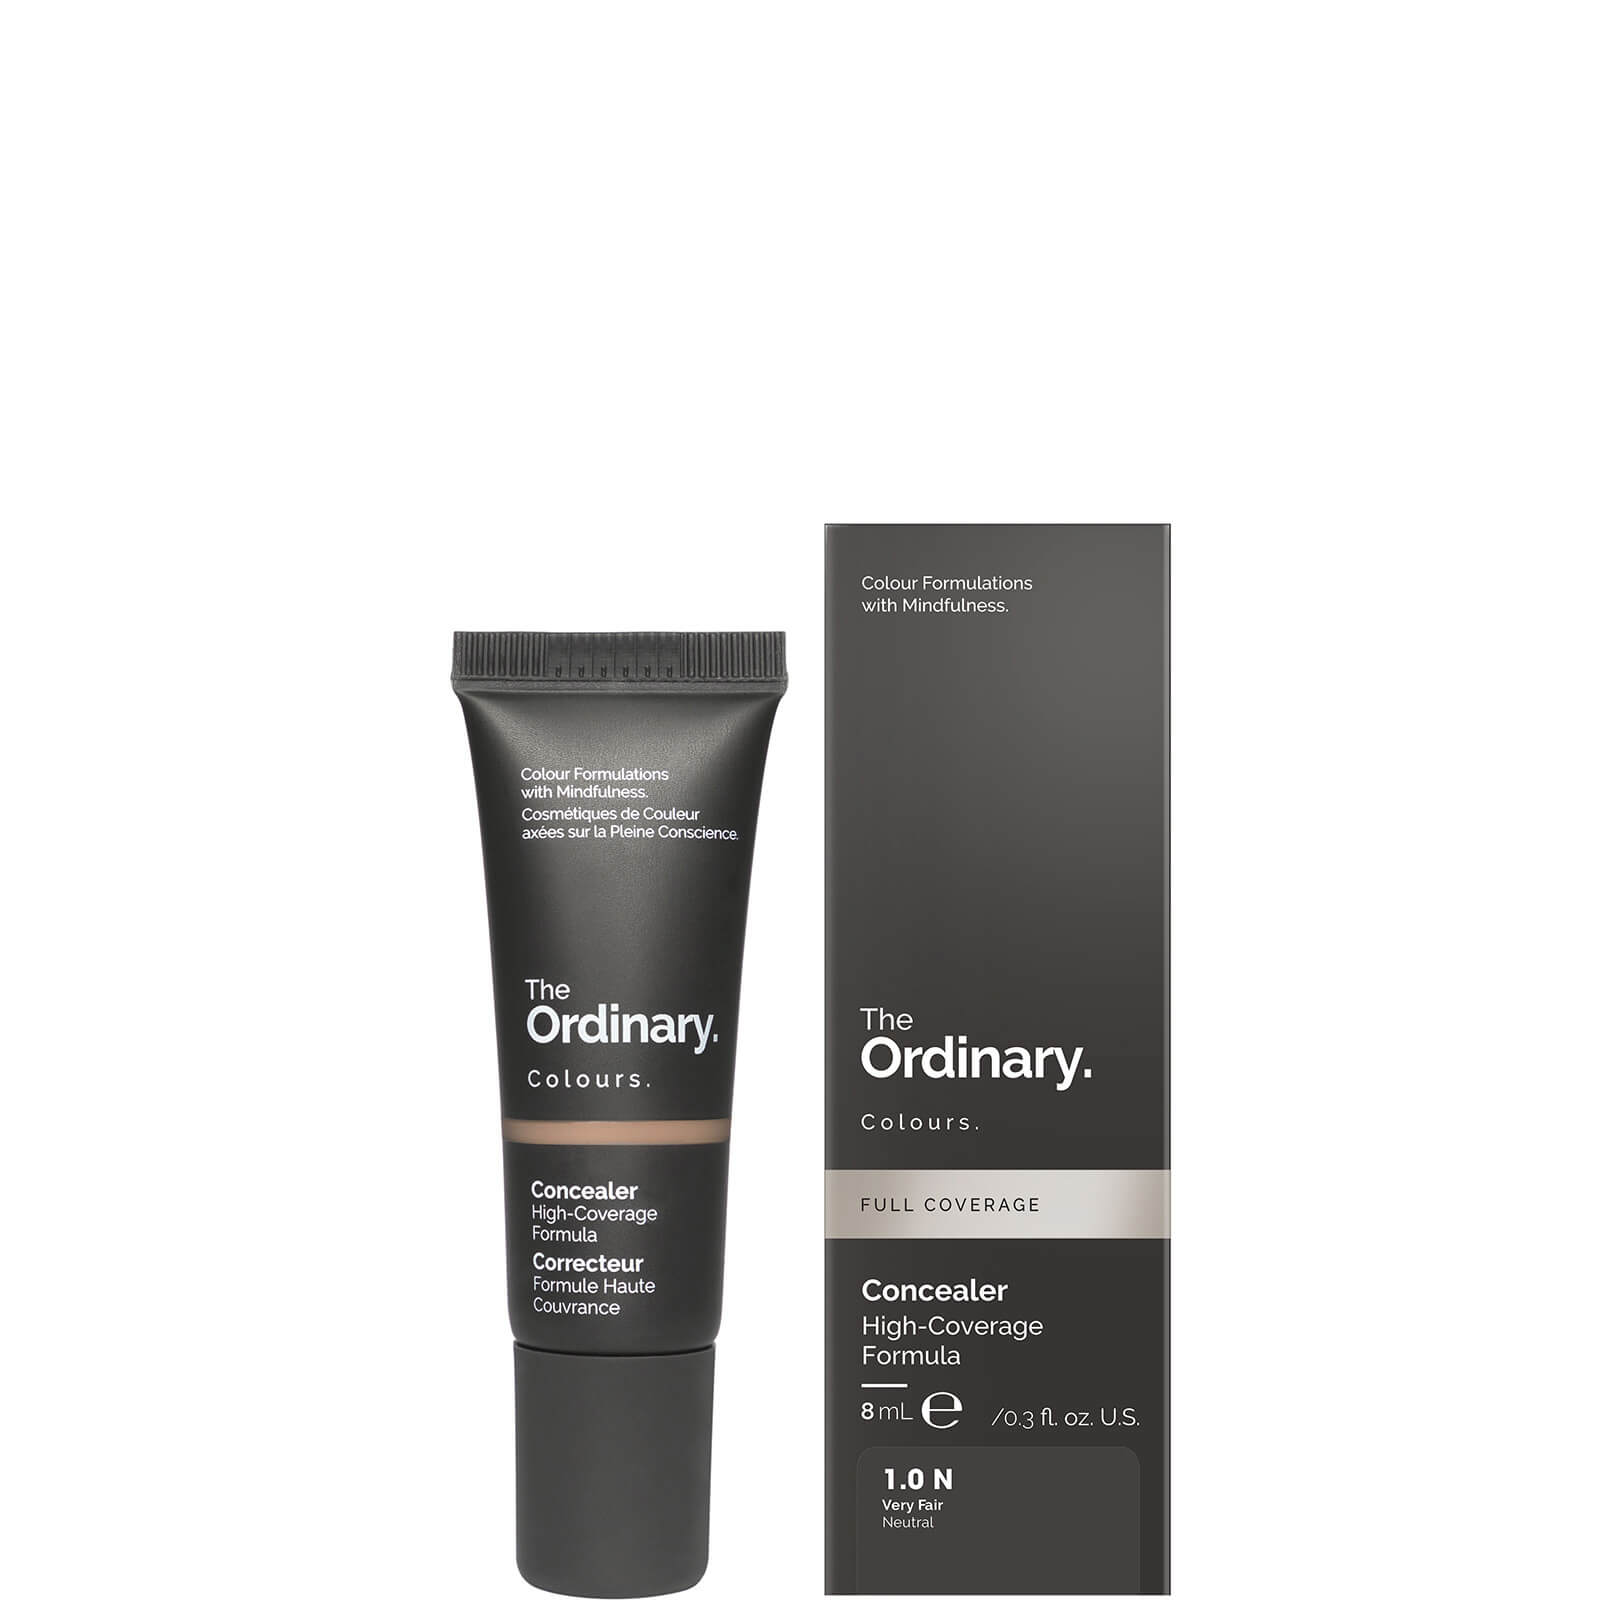 The Ordinary Concealer - 1.0 N 8ml  - Купить